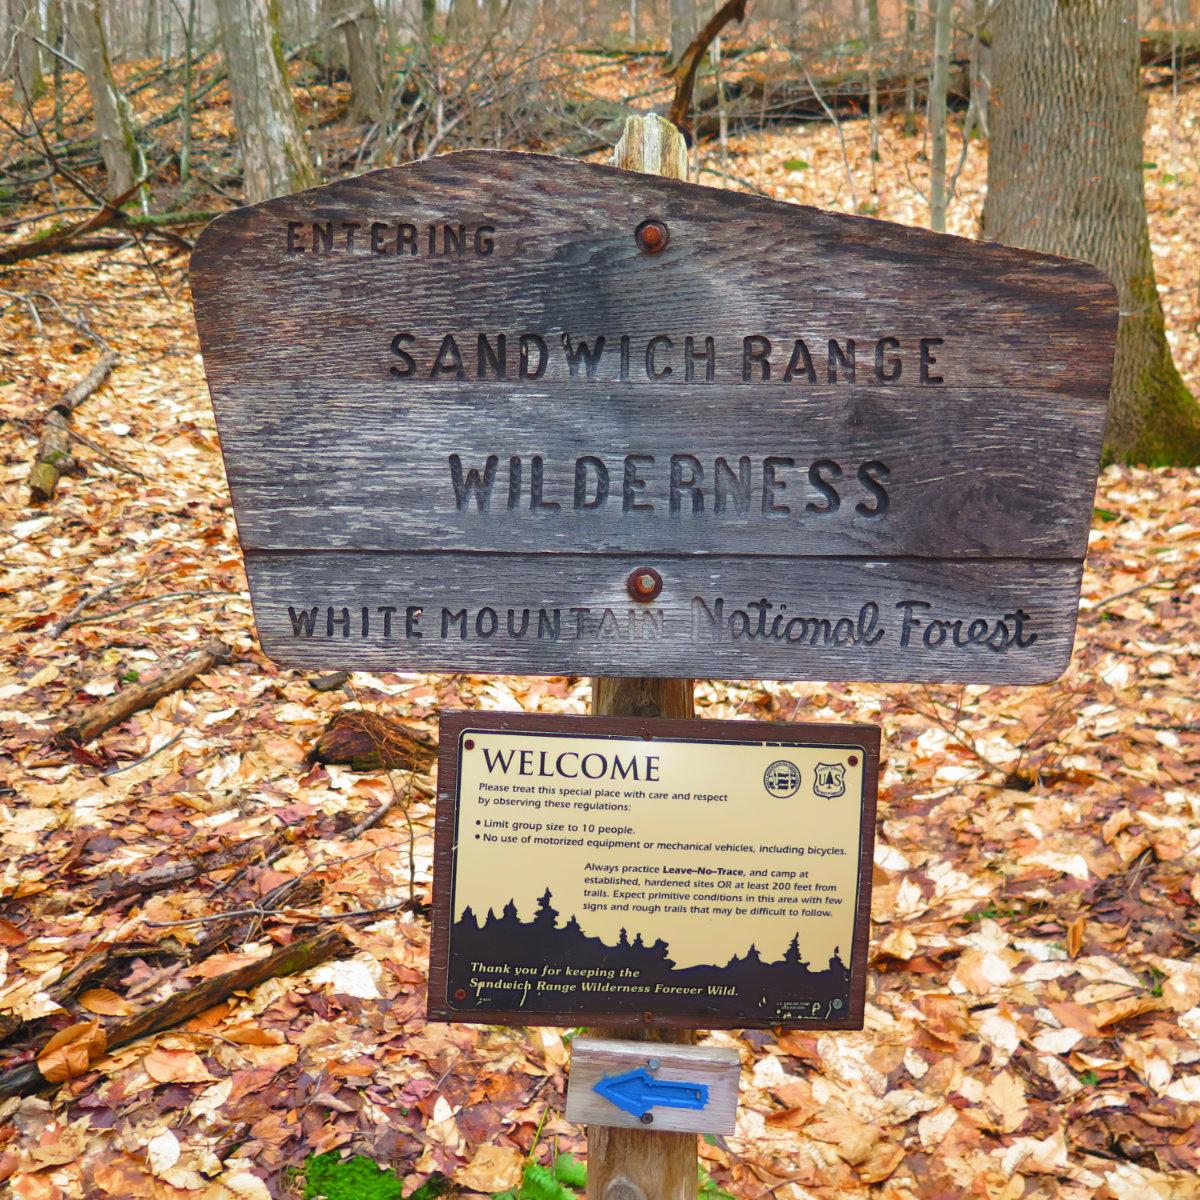 Whiteface-Passaconaway-Sandwich-Wilderness-Sign-20190424